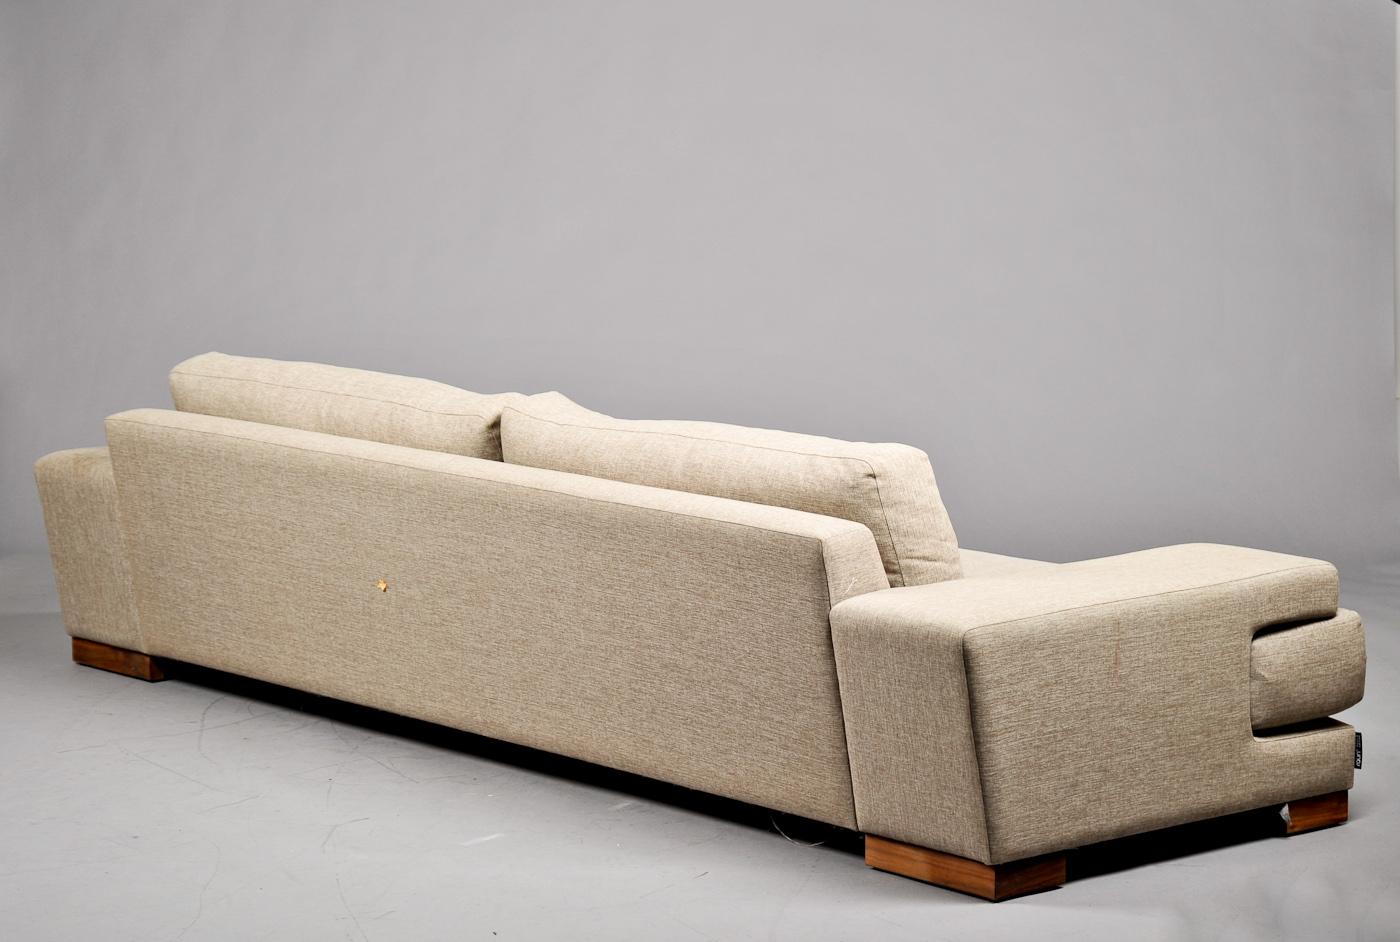 billig hrnsoffa awesome full size of billig sofa chaise. Black Bedroom Furniture Sets. Home Design Ideas